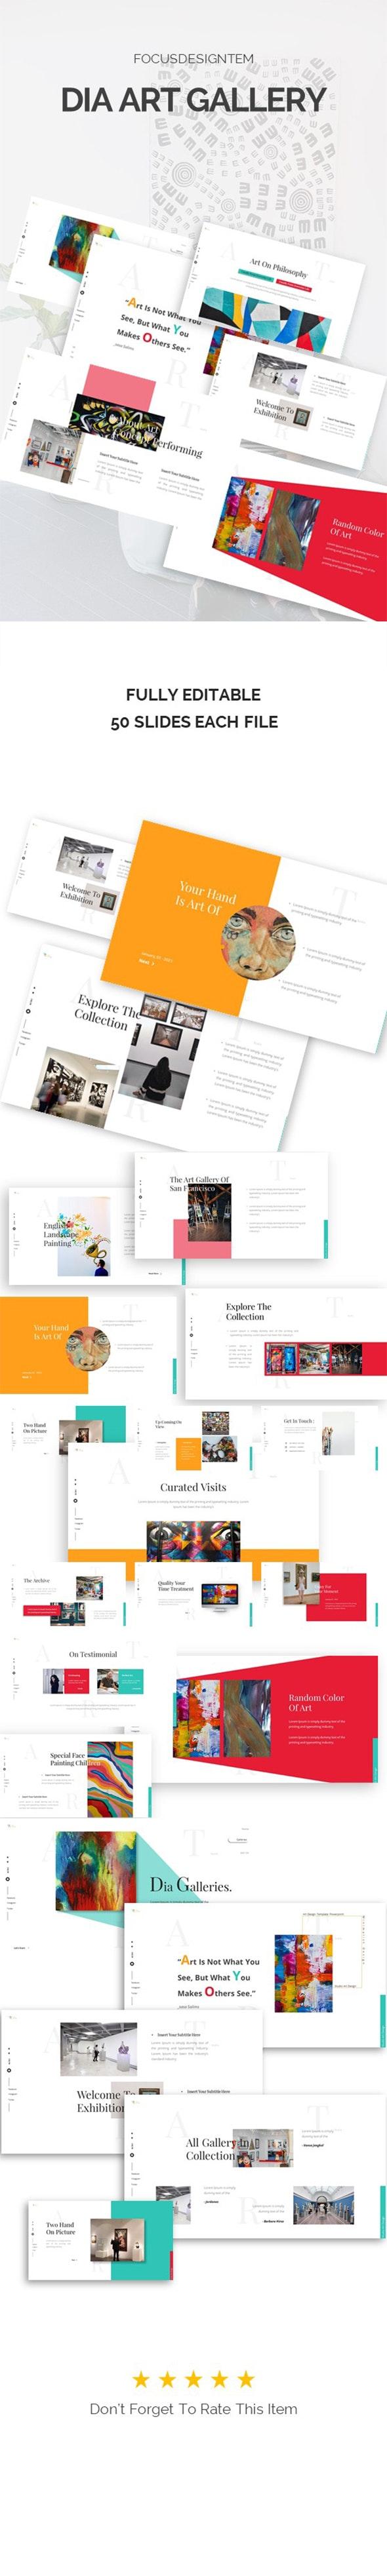 Dia Art Gallery Powerpoint Template - PowerPoint Templates Presentation Templates